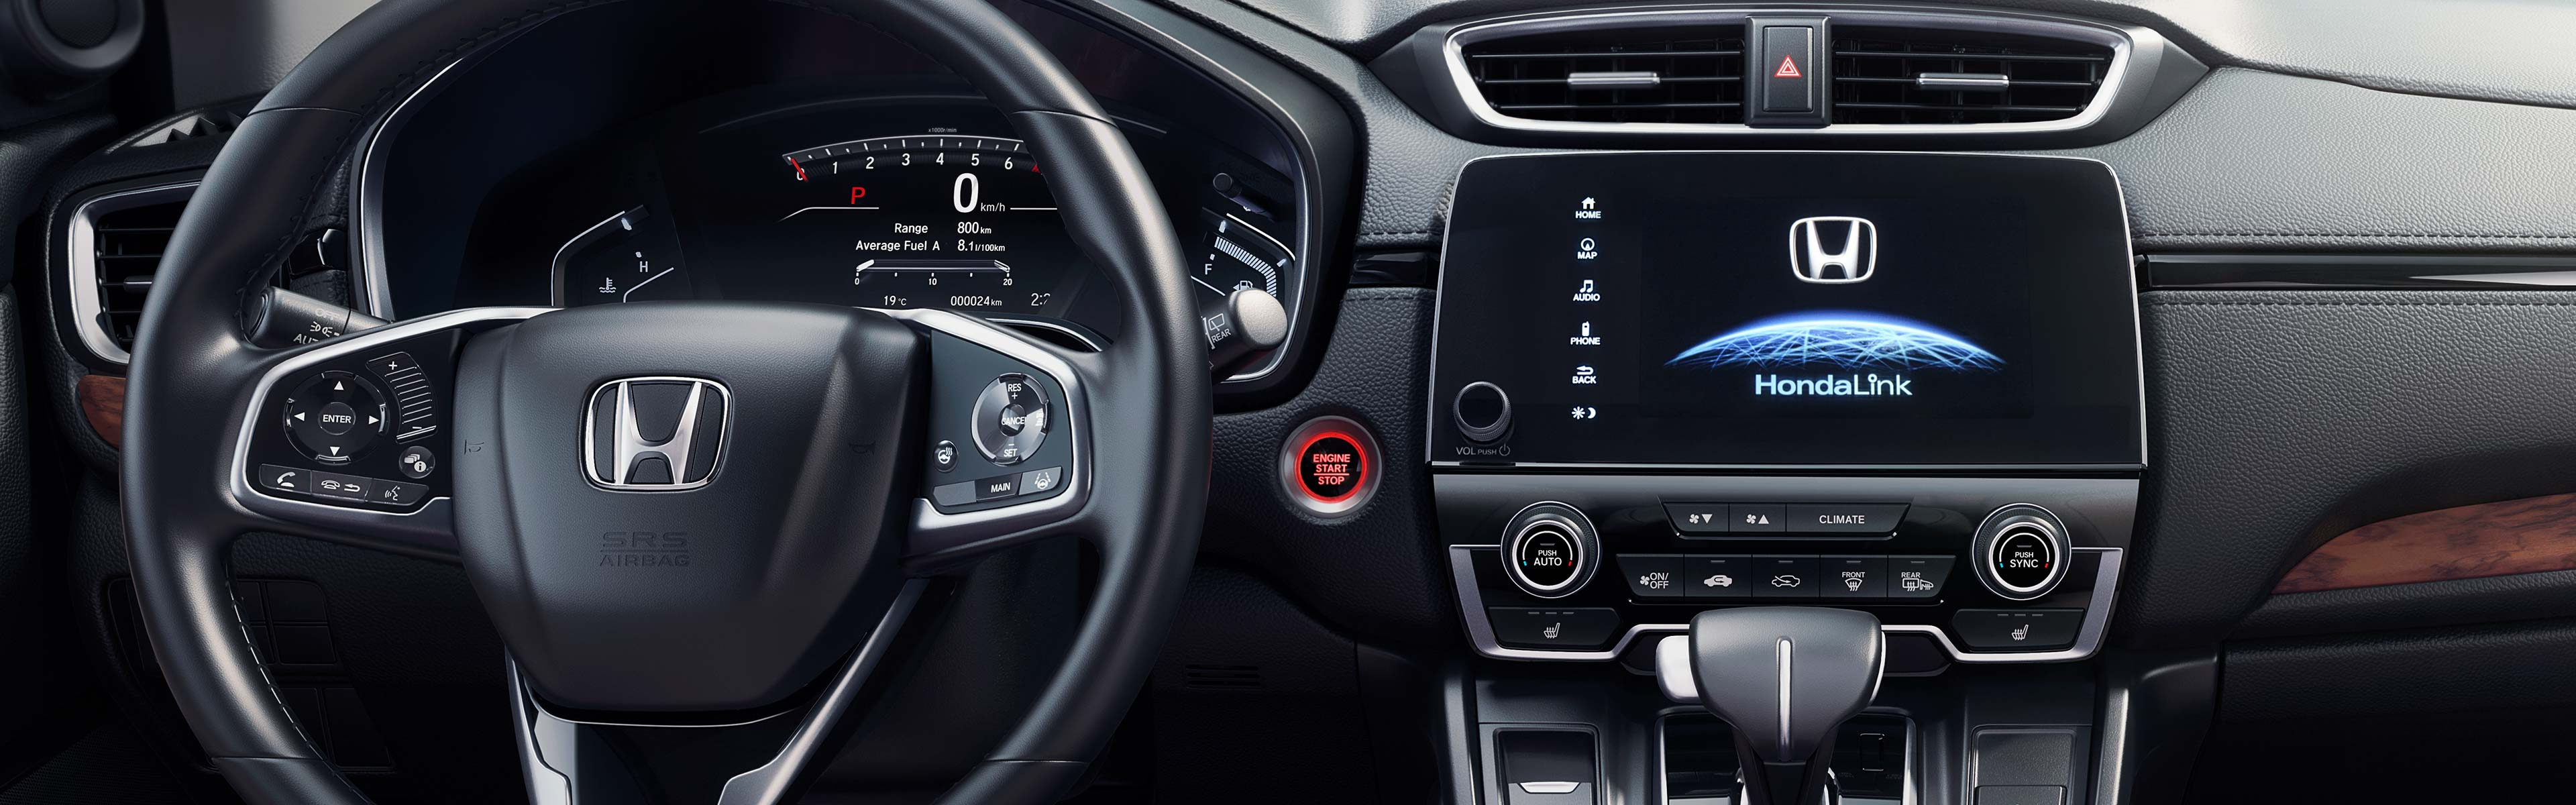 Interior | 2017 CR-V | Honda Canada